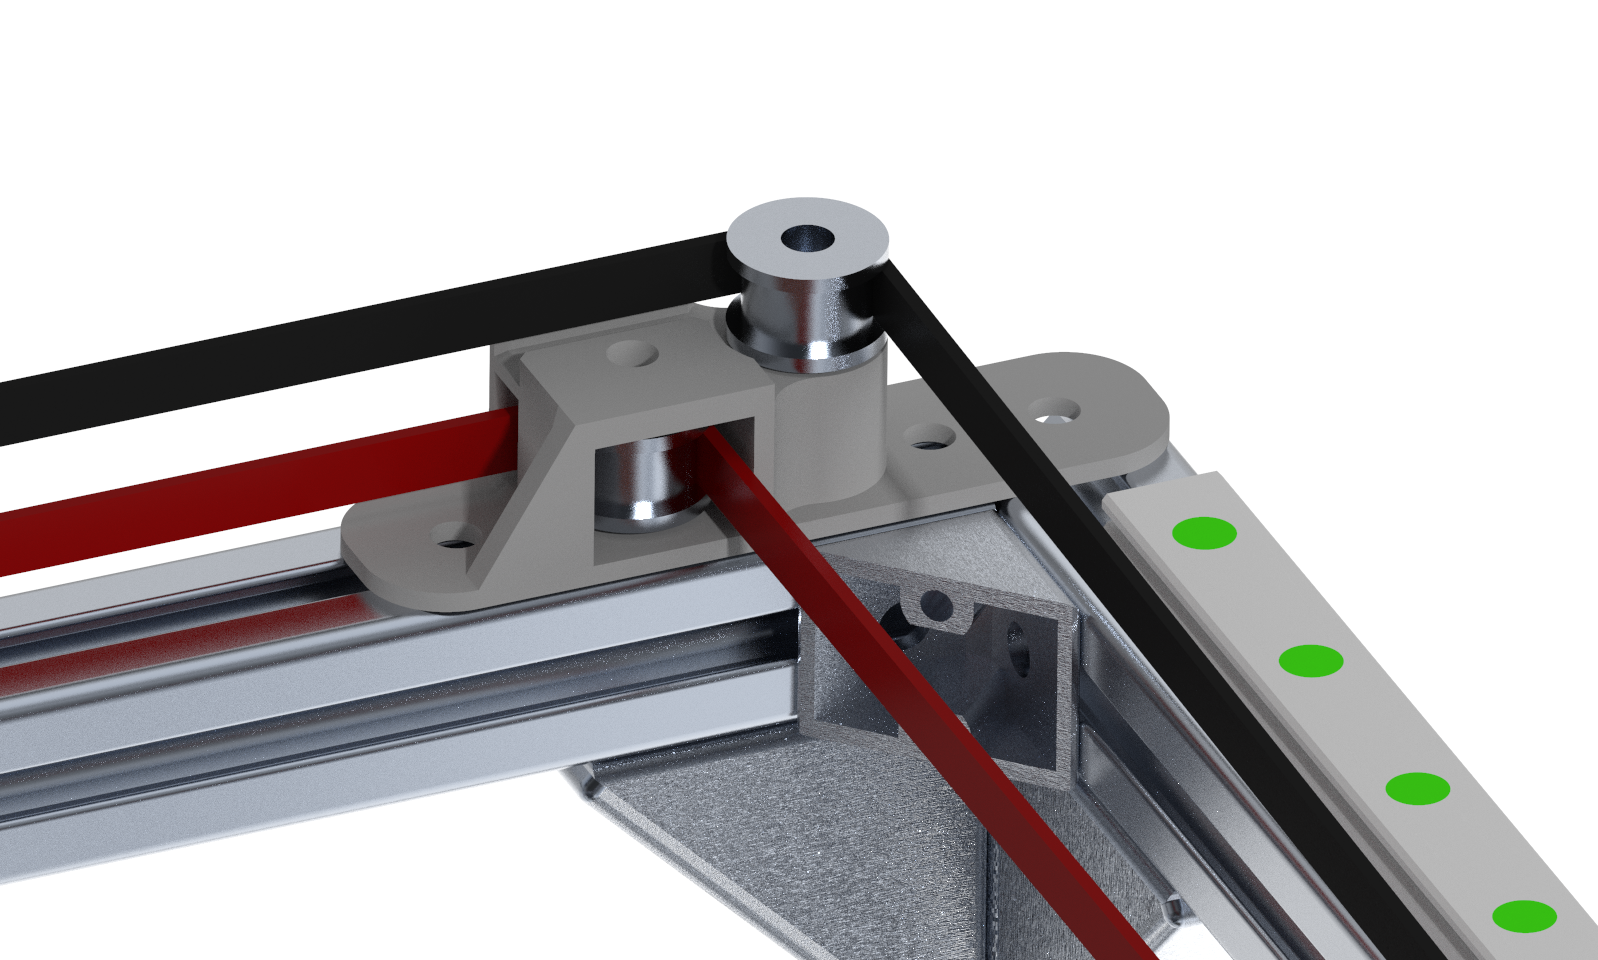 3D printed idler mount